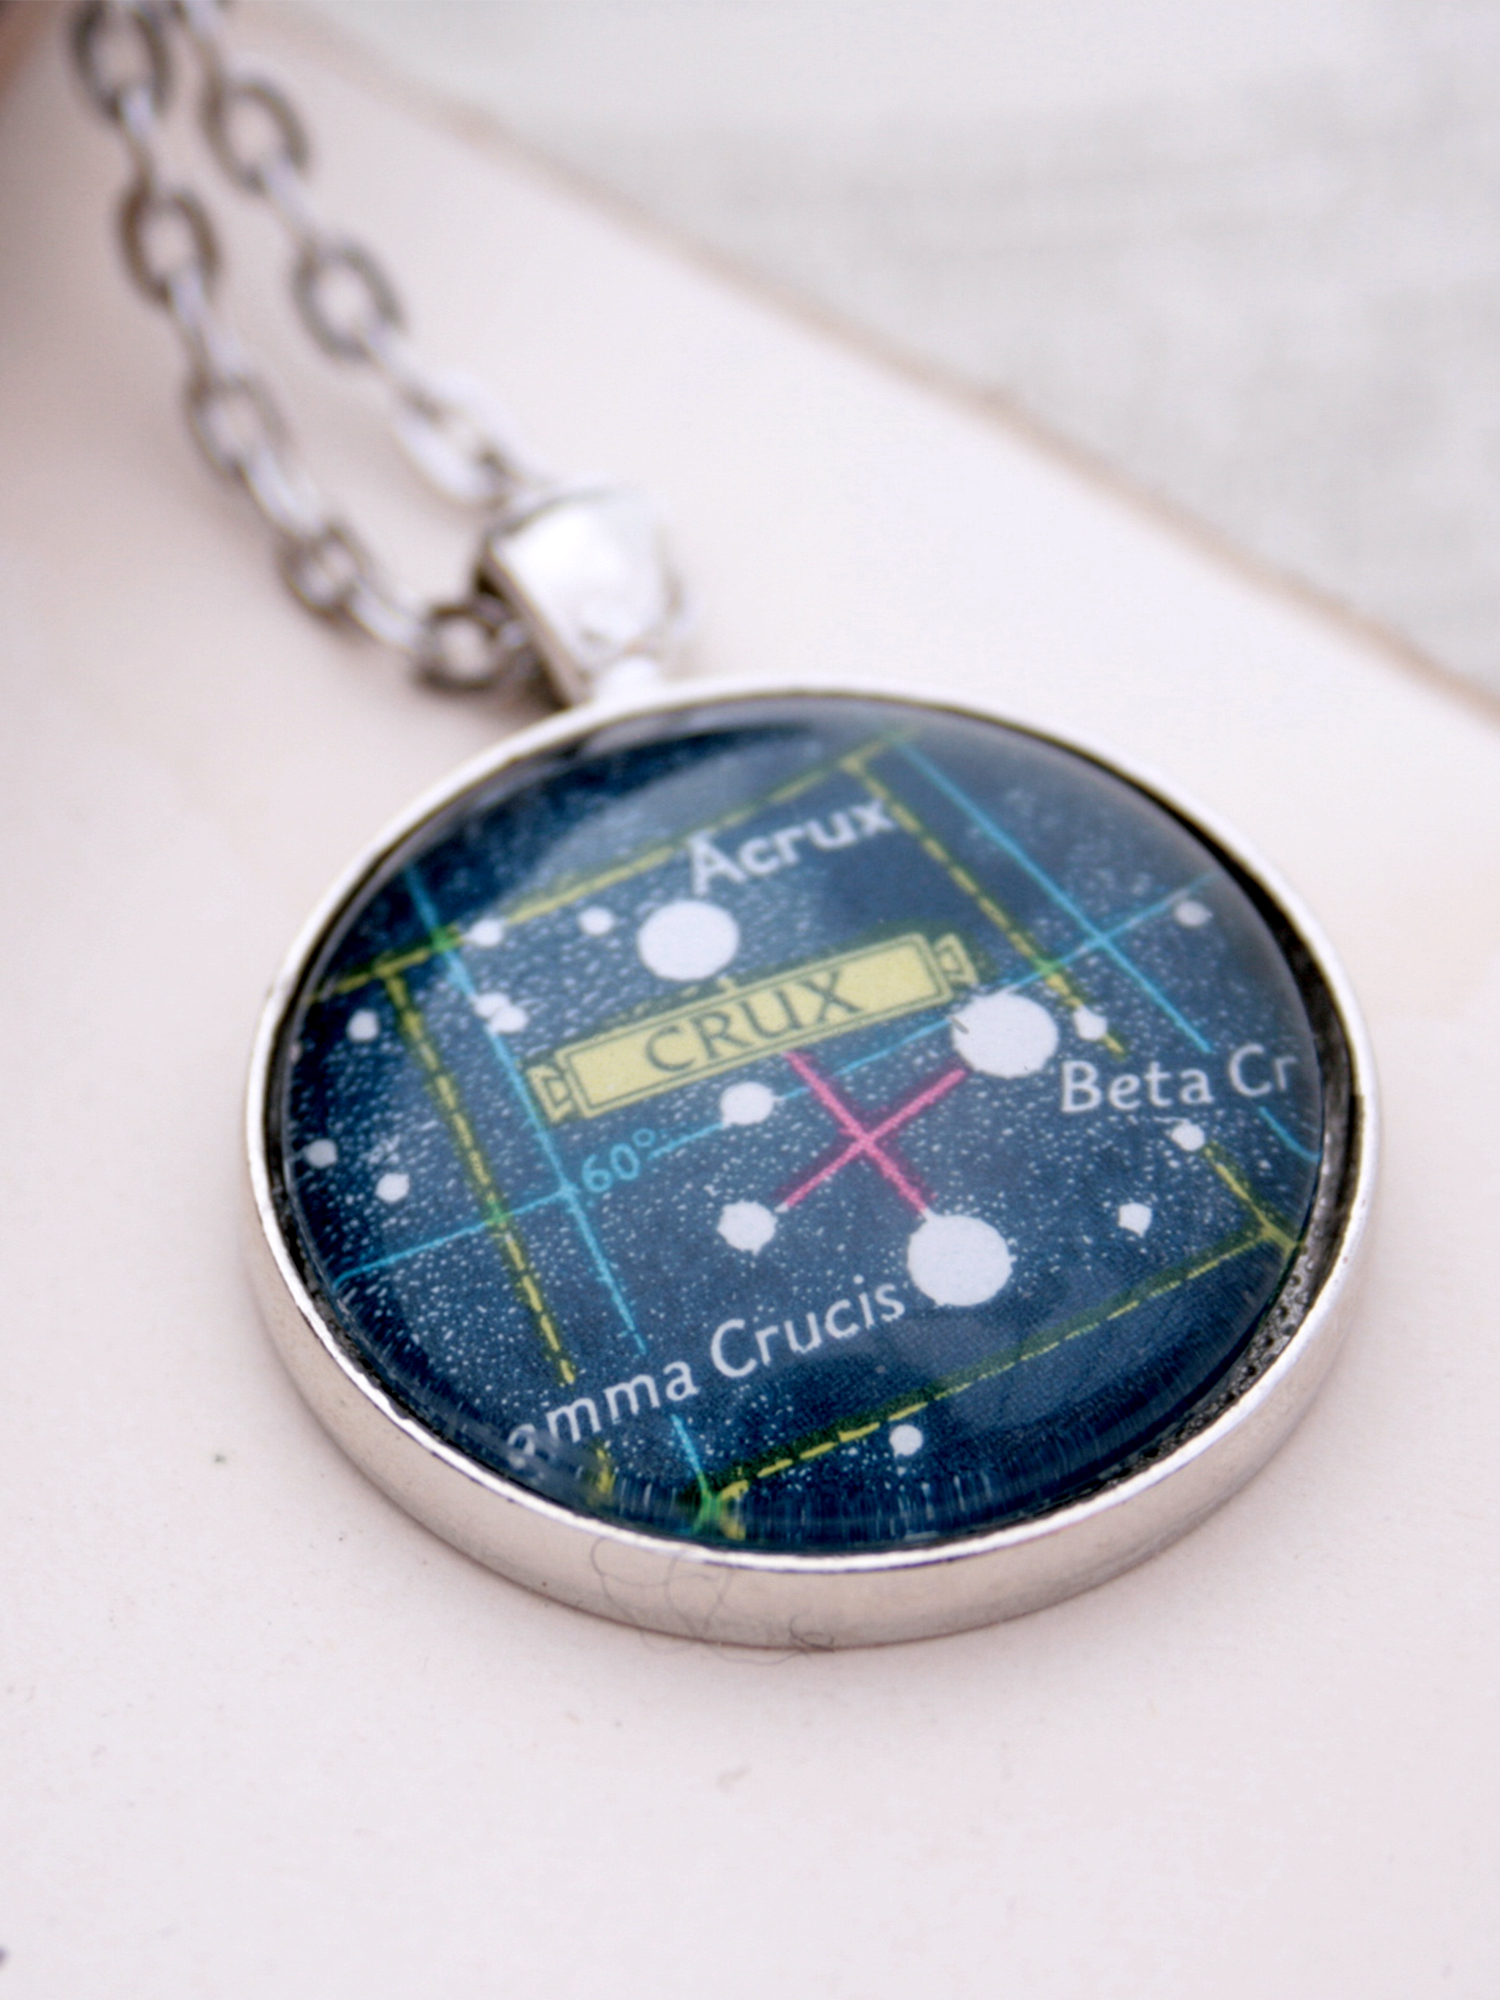 Crux constellation necklace